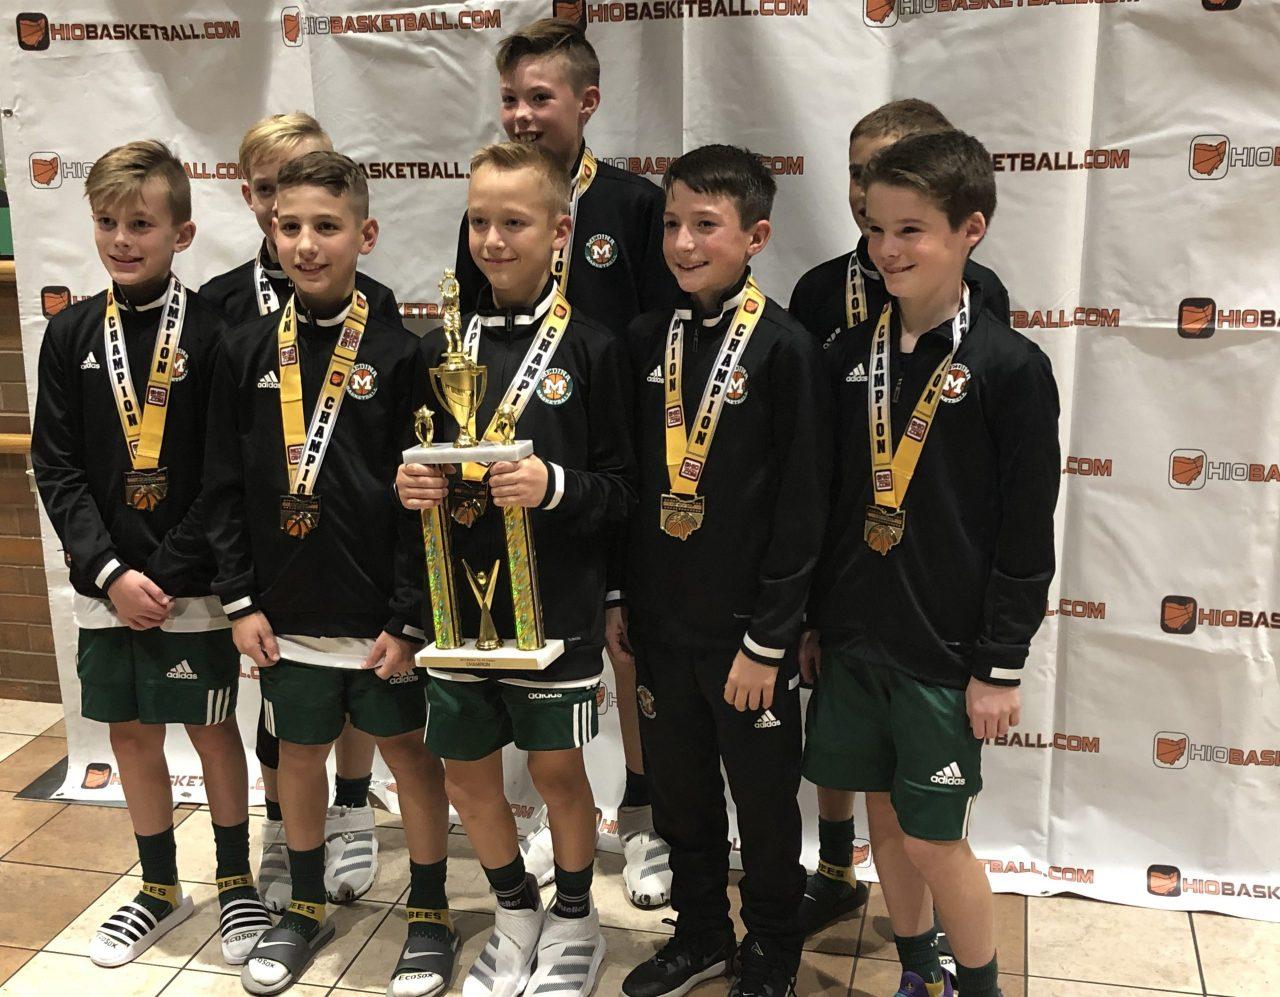 5th Boys A Gold Champion Medina